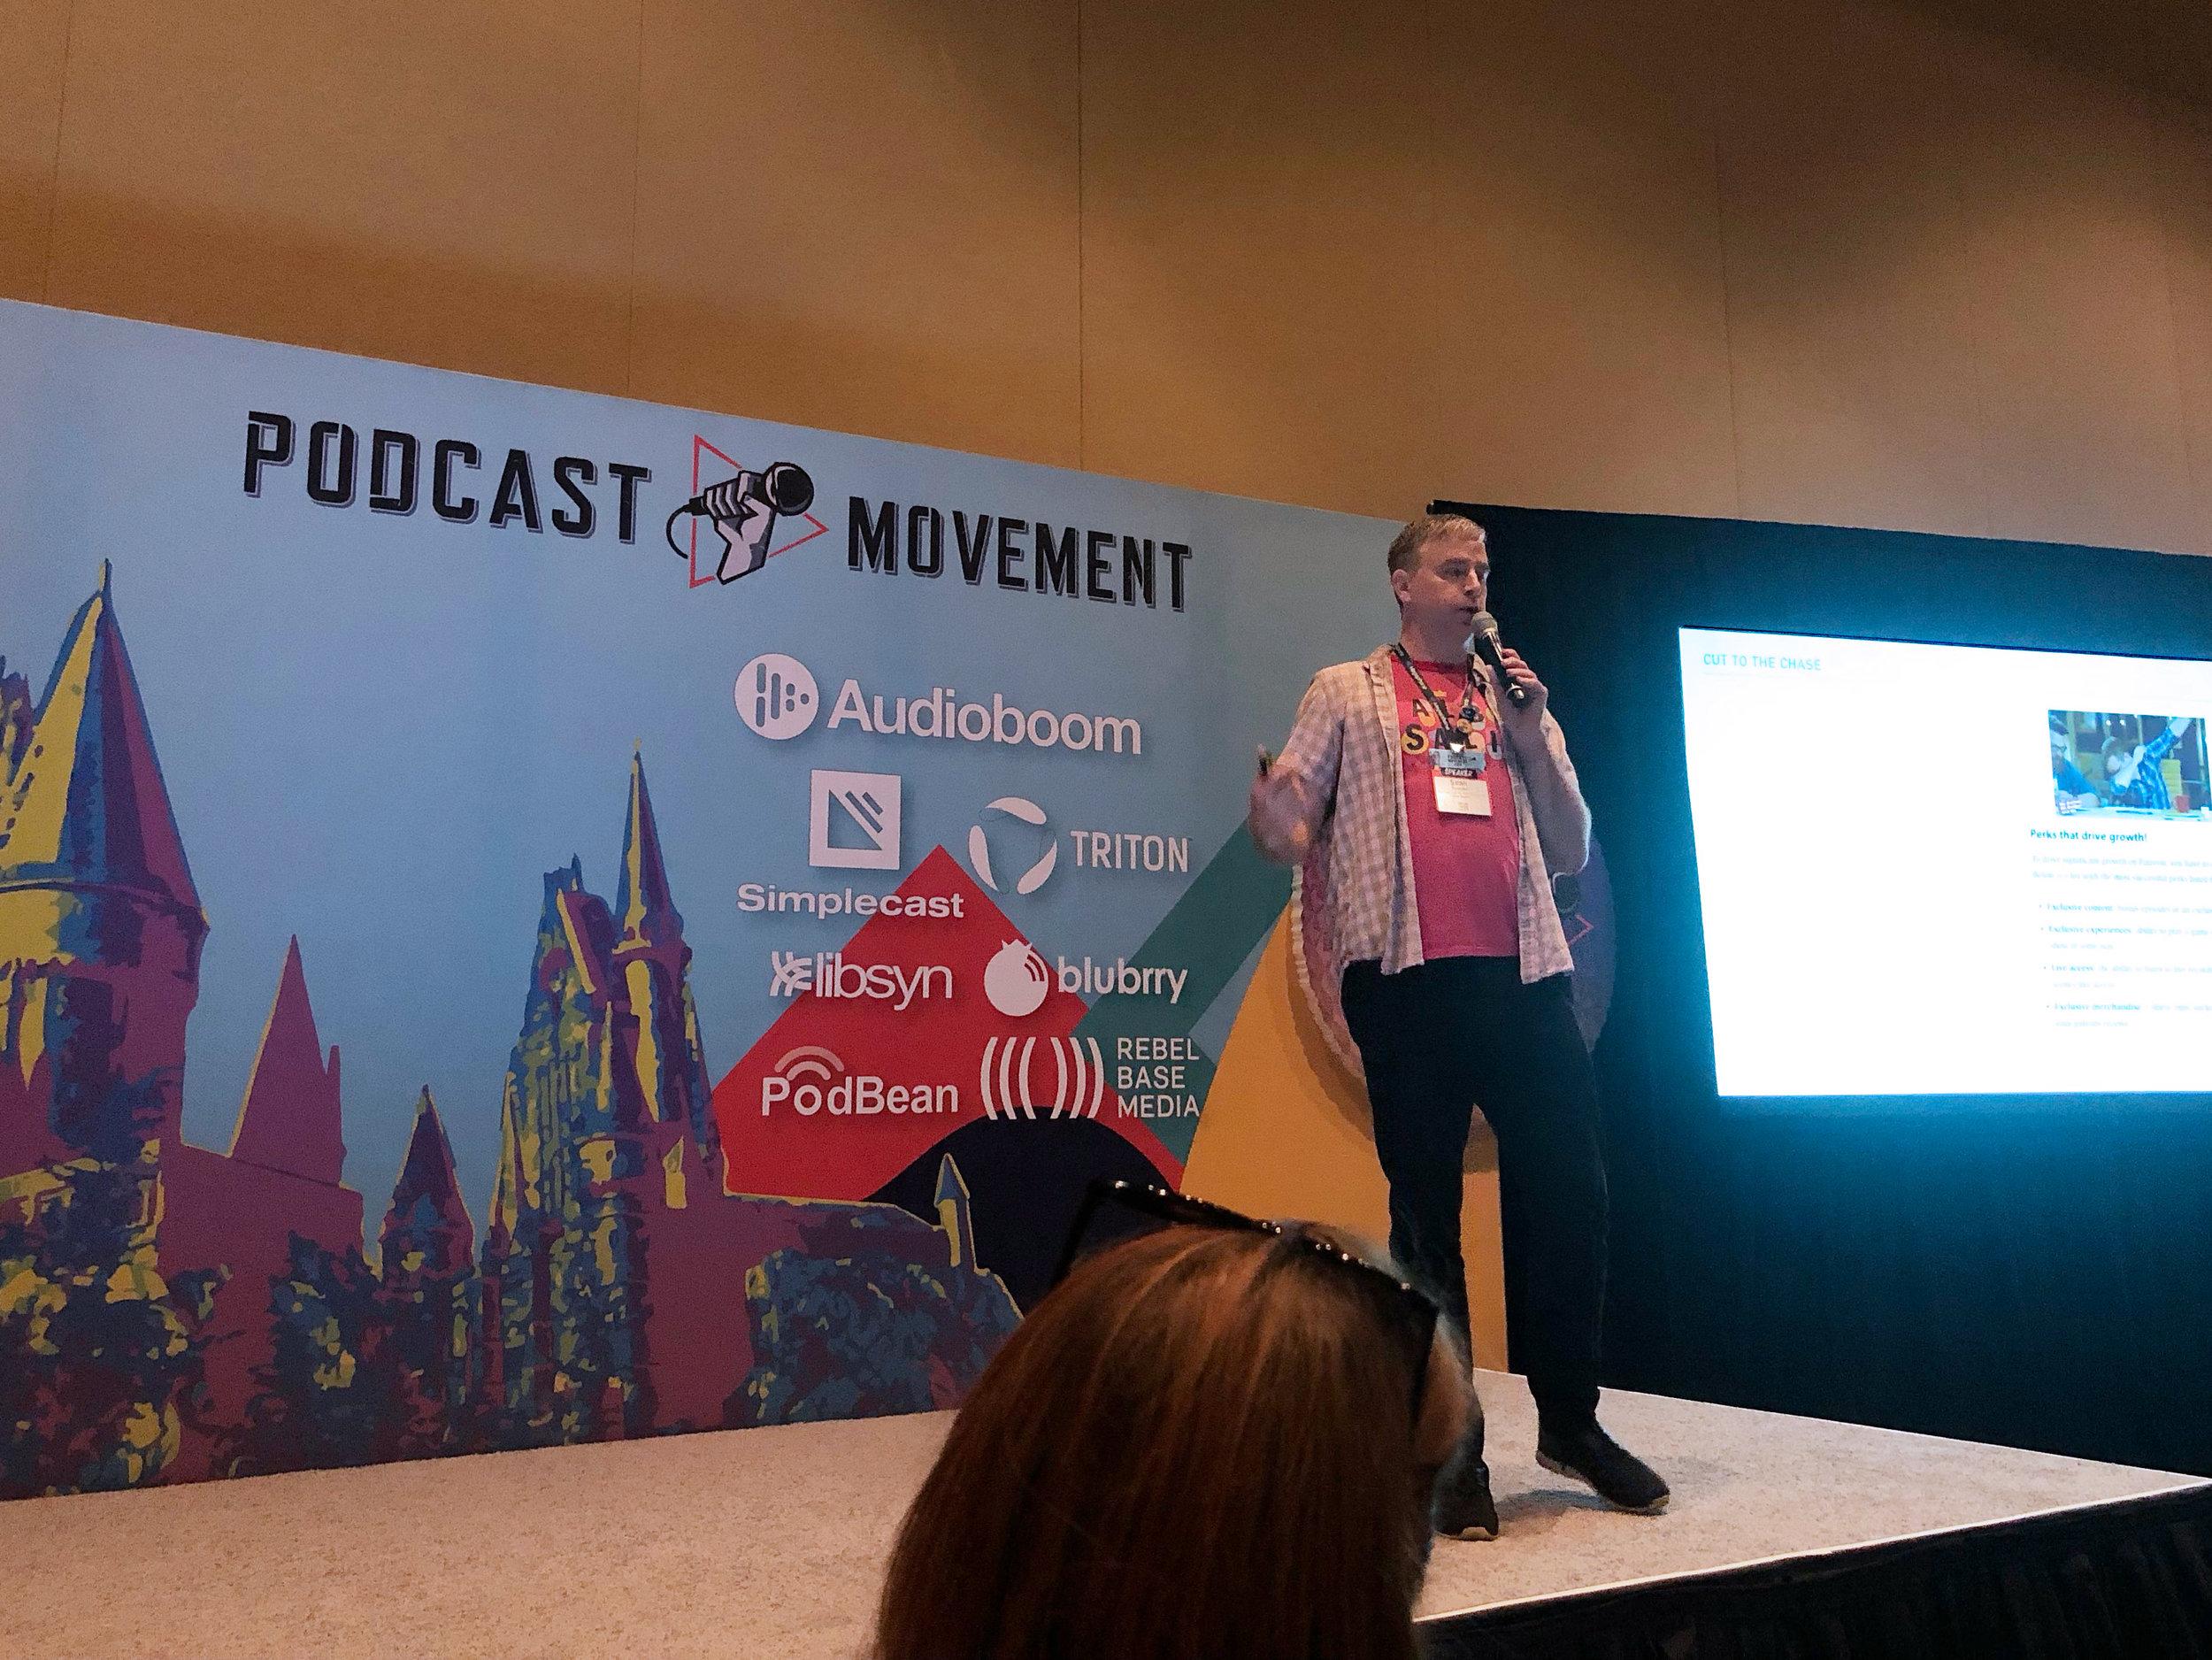 podcast_movement_opening_2019.jpg